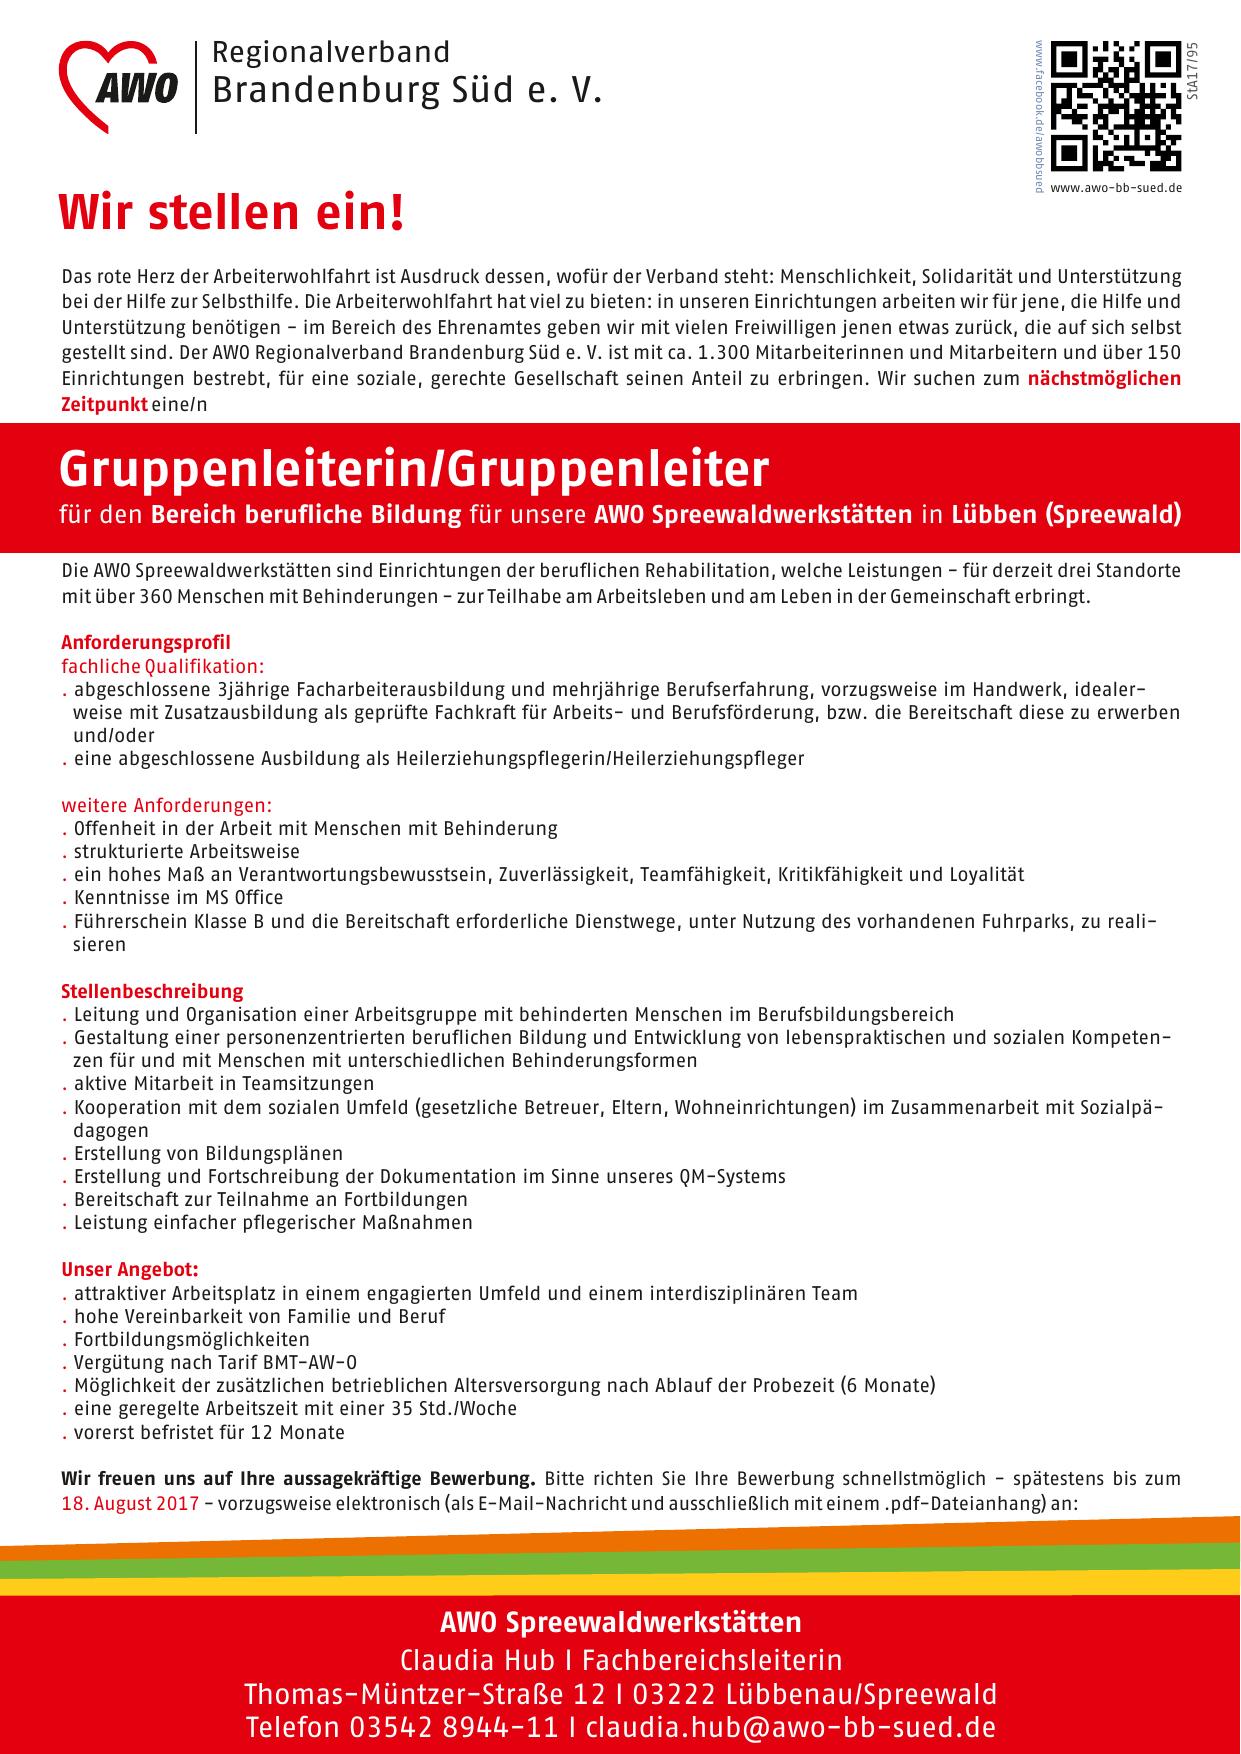 AWO Arbeiterwohlfahrt Brandenburg Süd e.V. | News